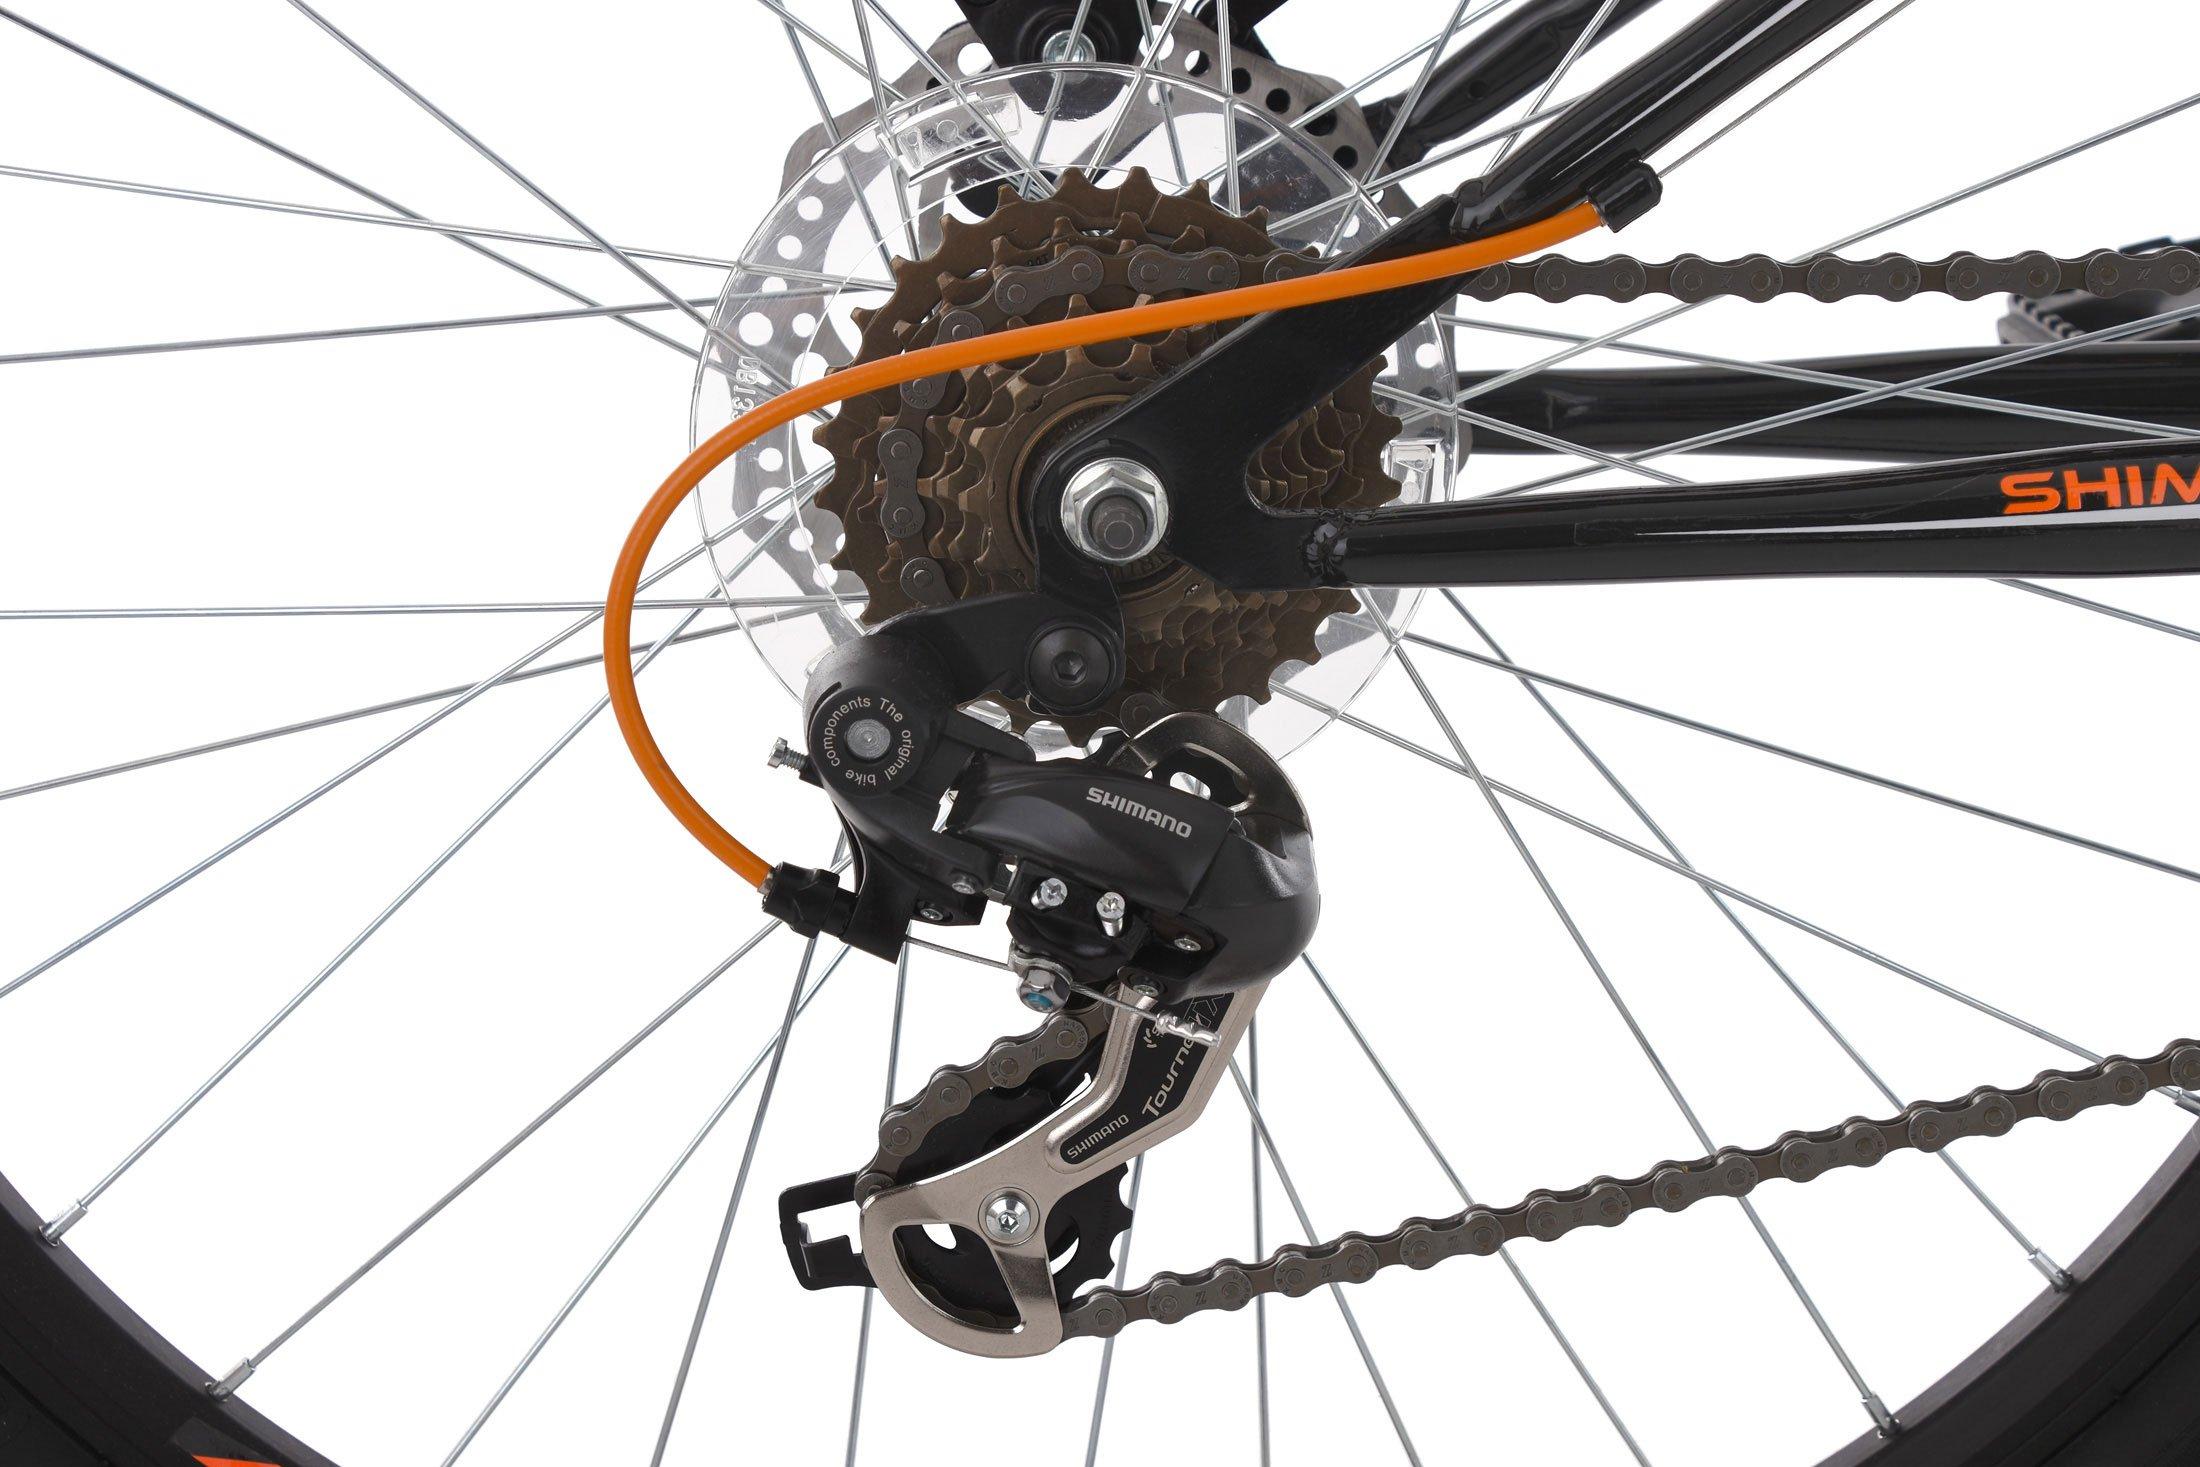 KS Cycling Adultos Mountain Bike MTB xtraxx Negro de Naranja RH 46 cm, Negro/Naranja, 26 Pulgadas: Amazon.es: Deportes y aire libre